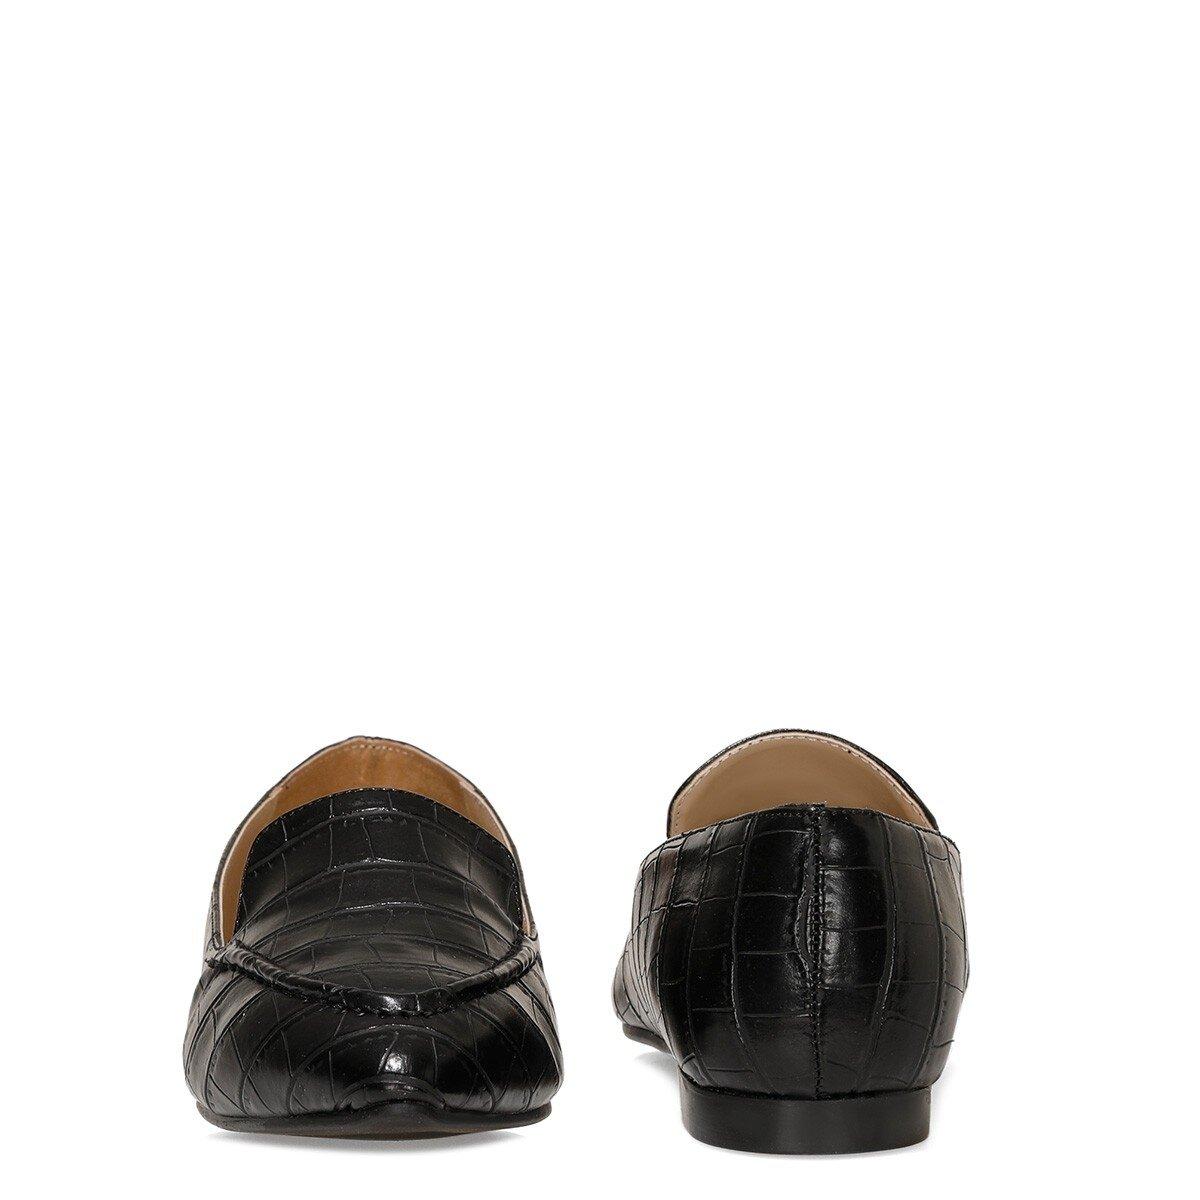 SIMPA 1FX Siyah Kadın Loafer